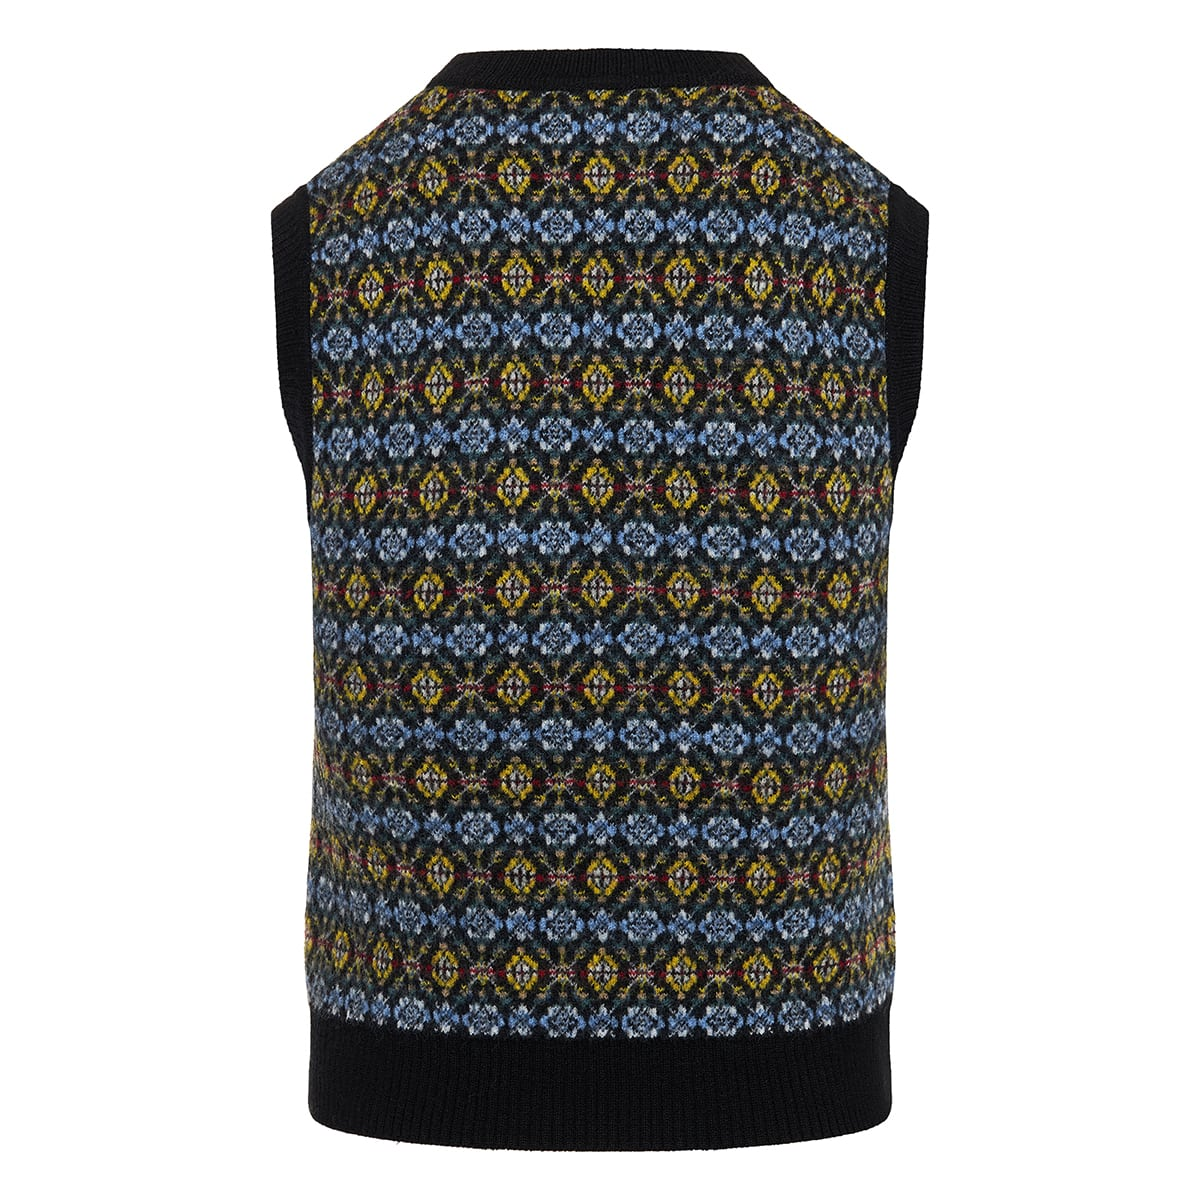 Patterned jacquard wool vest